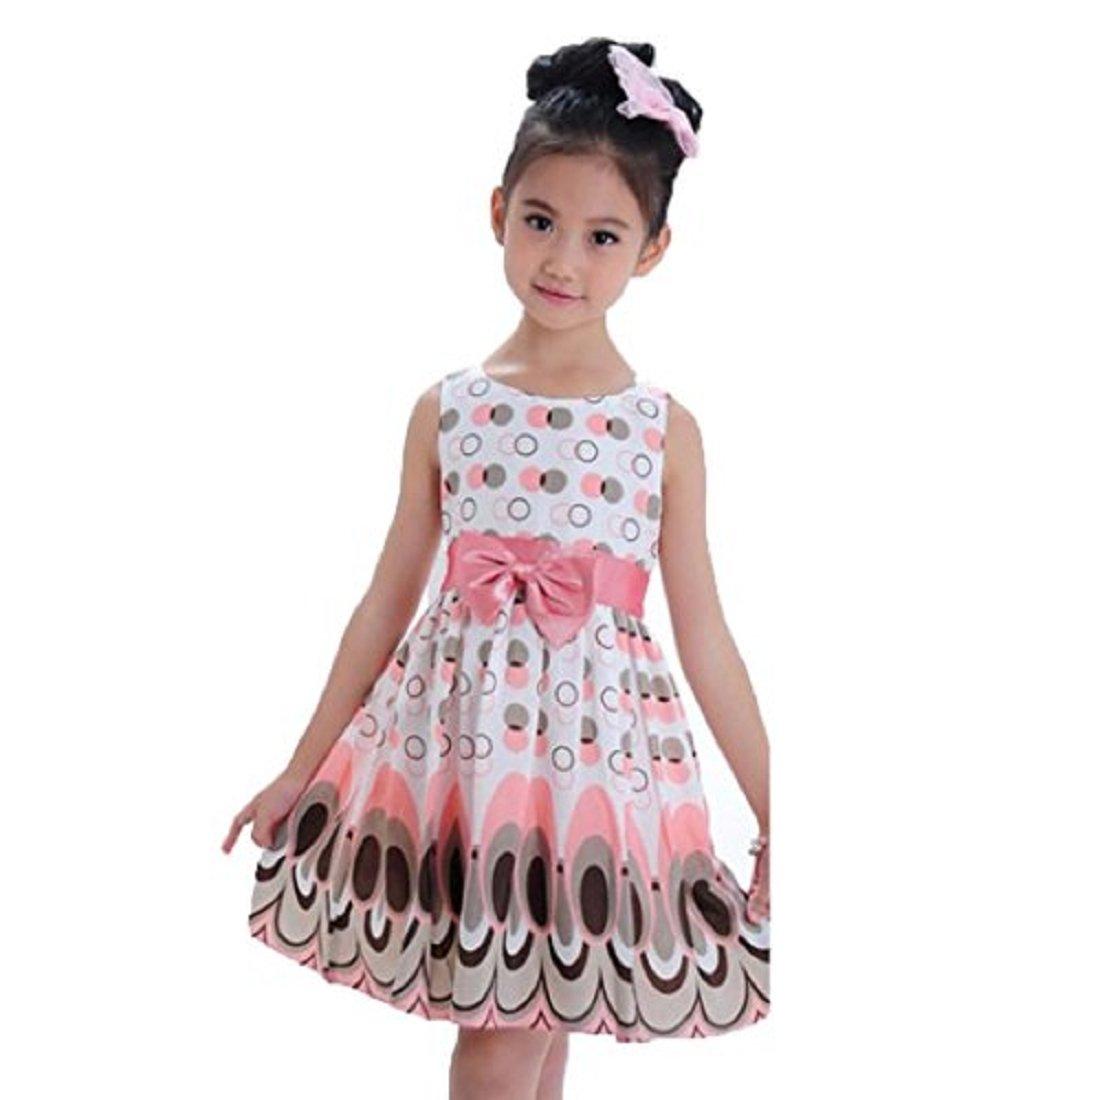 8dfb9ae1ae825b Internet New Kids Girls Bow Belt Sleeveless Bubble Peacock Dress Party  Clothing for 3-7 Years Old: Amazon.co.uk: Clothing